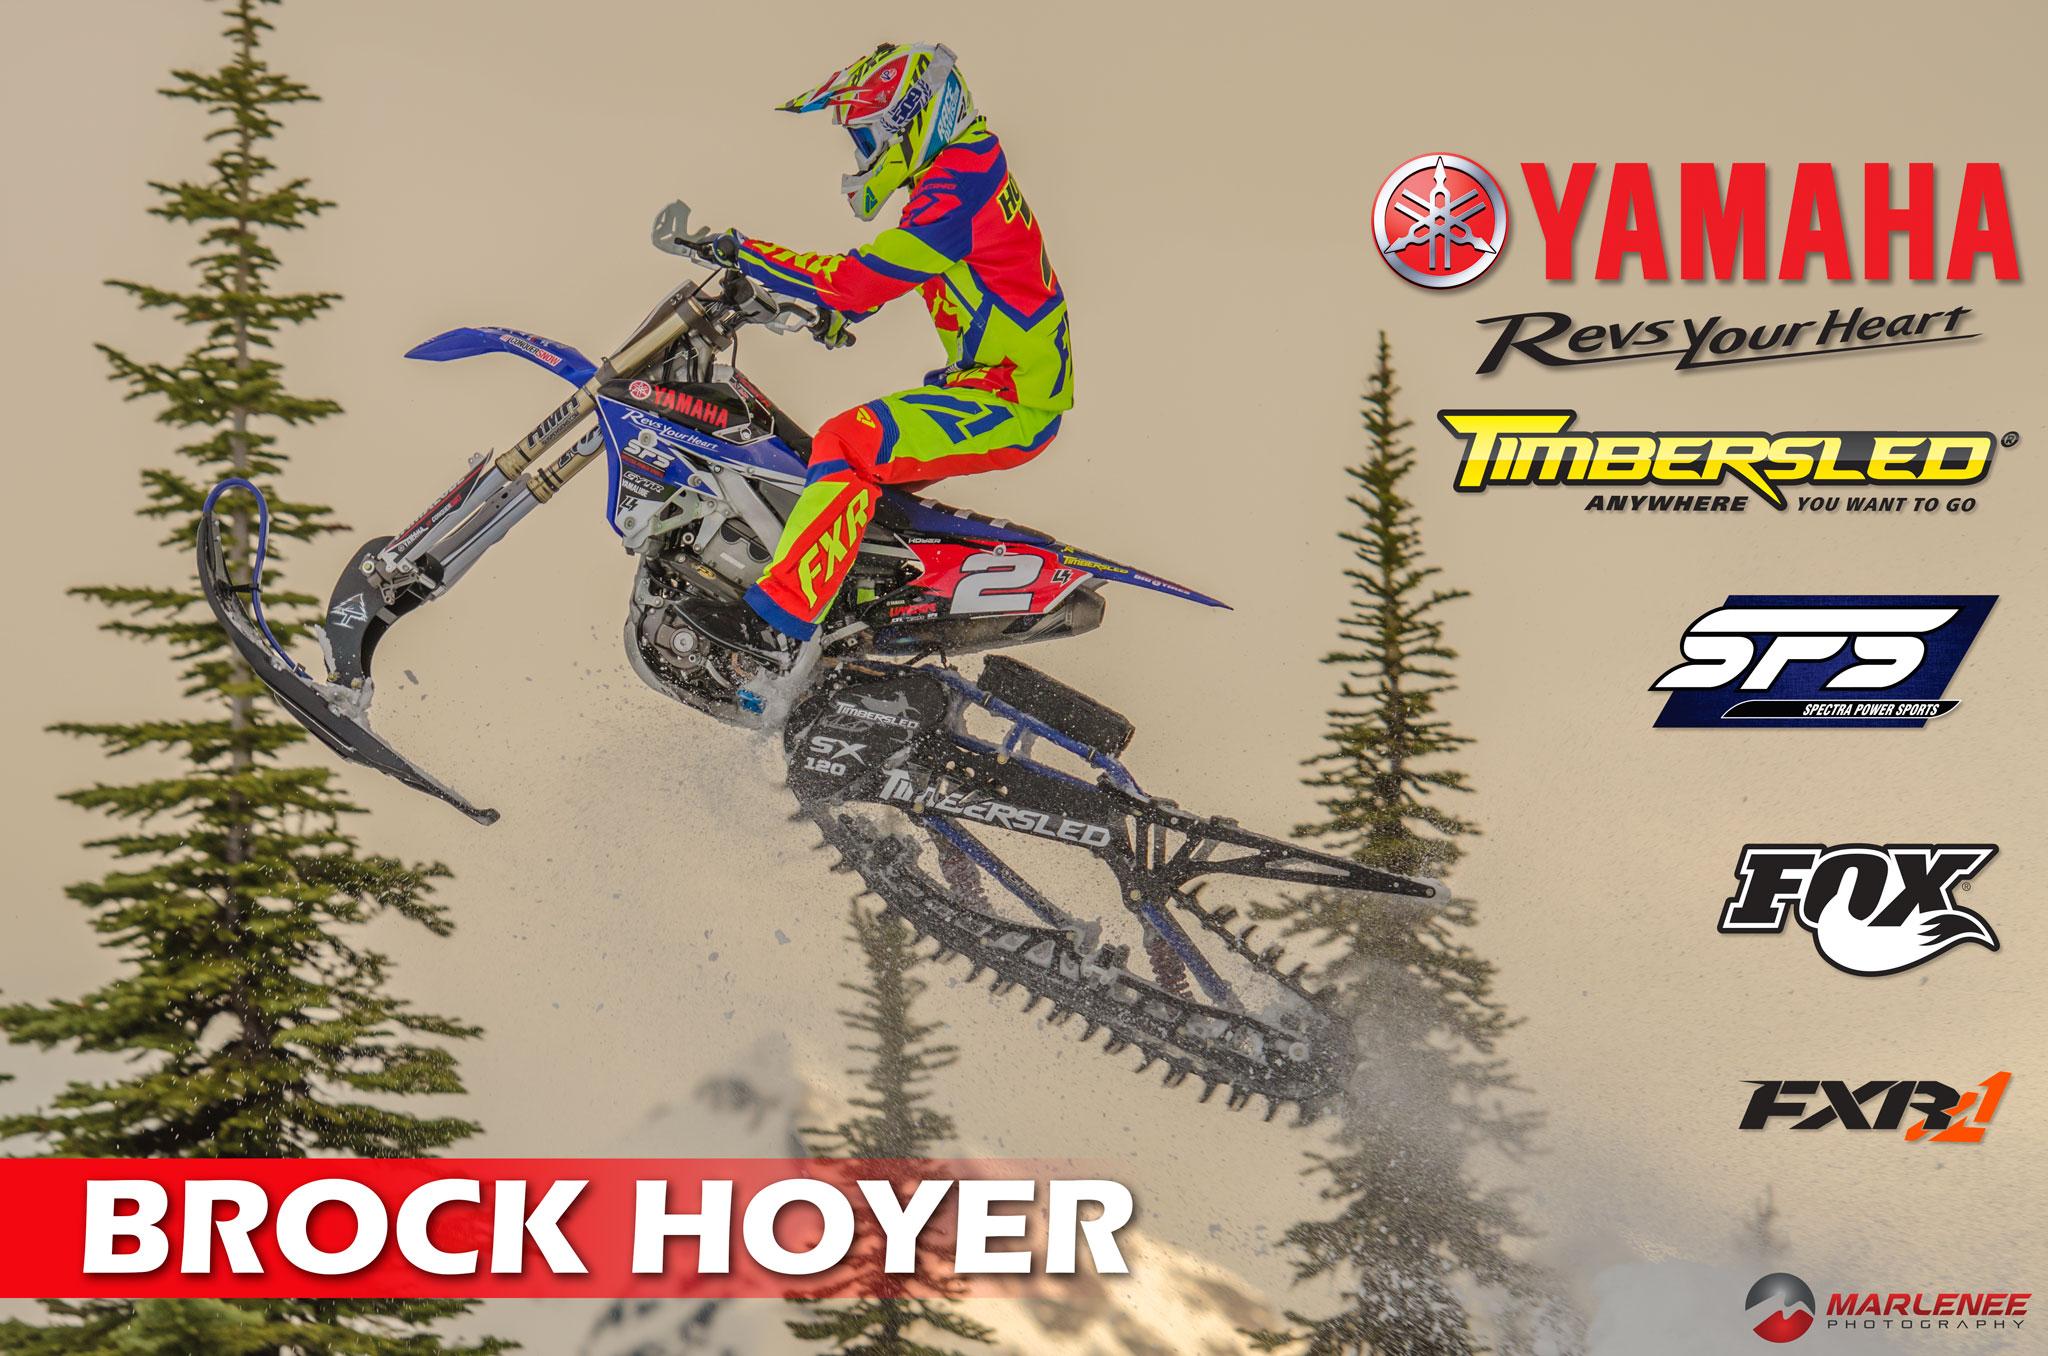 Brock Hoyer Timbersled Poster